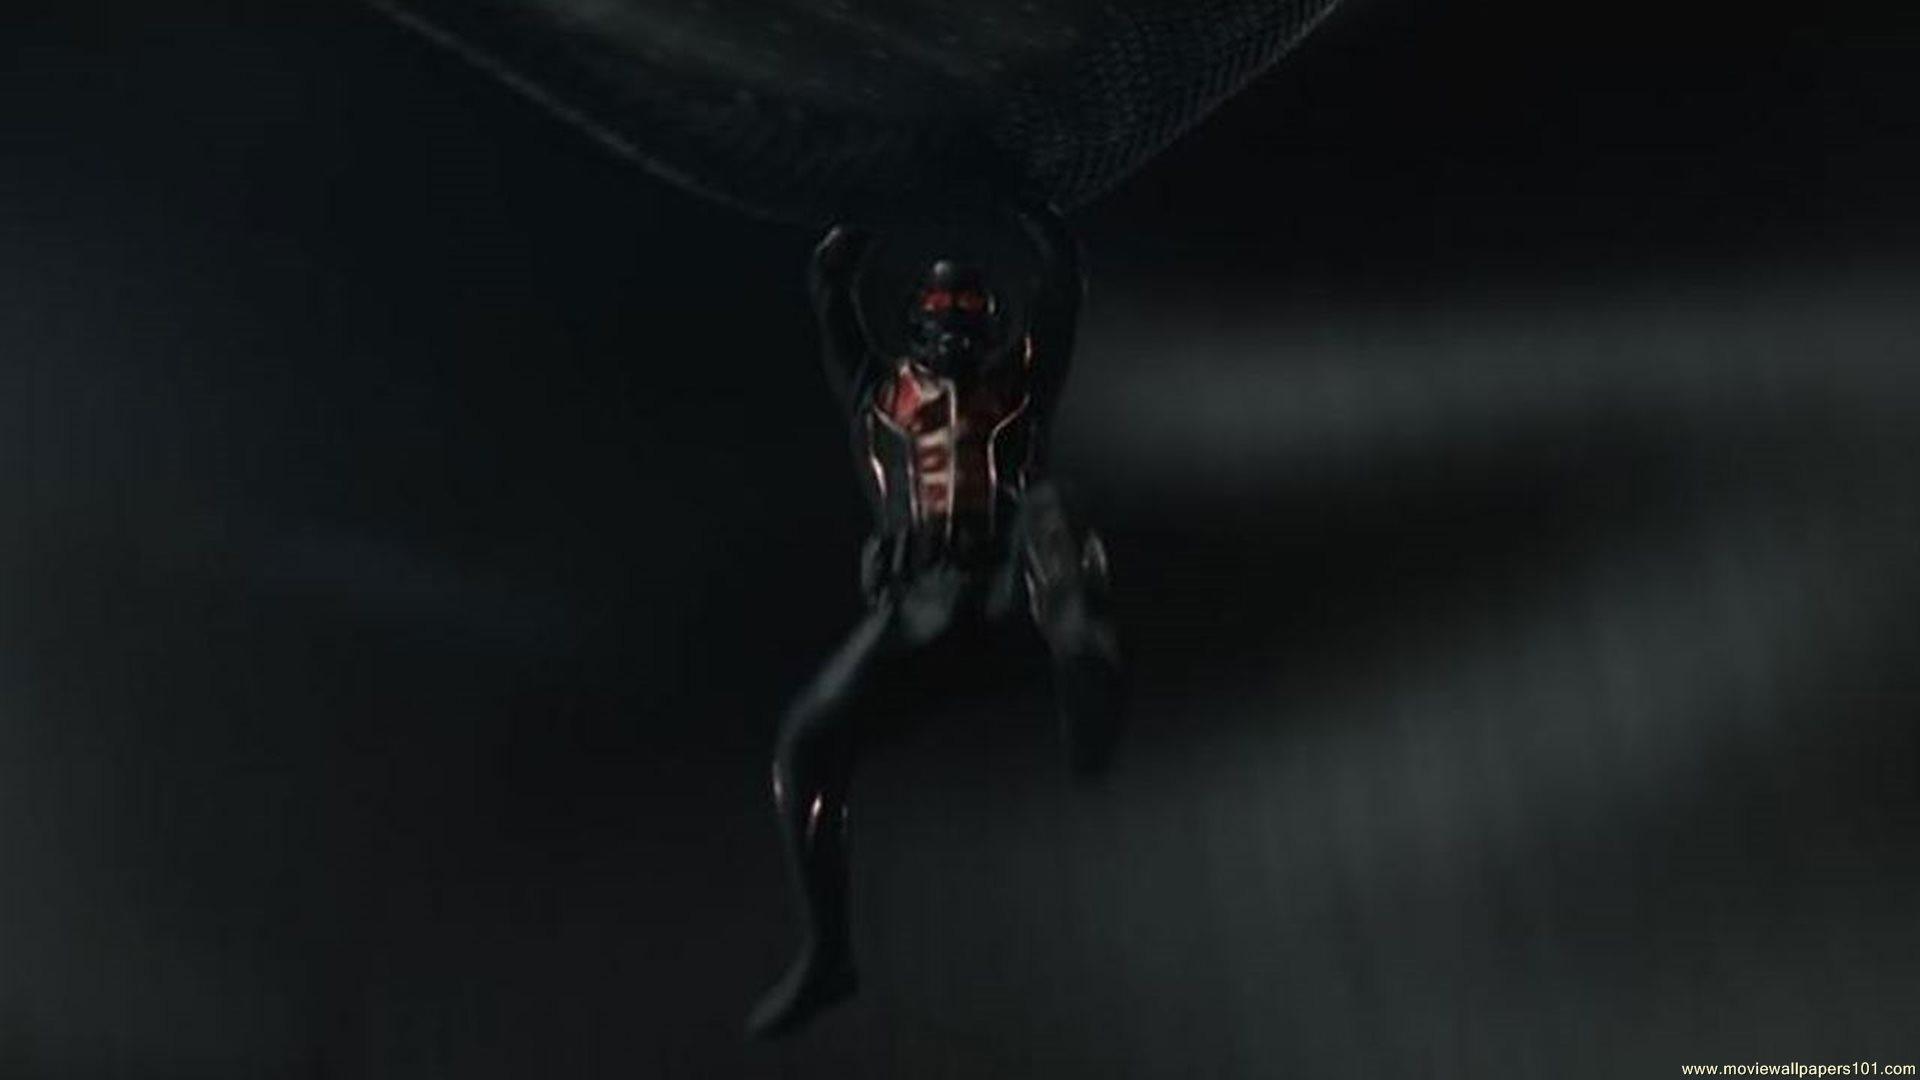 Ant Man 2015 Movie Trailer HD Wallpaper   Stylish HD Wallpapers 1920x1080